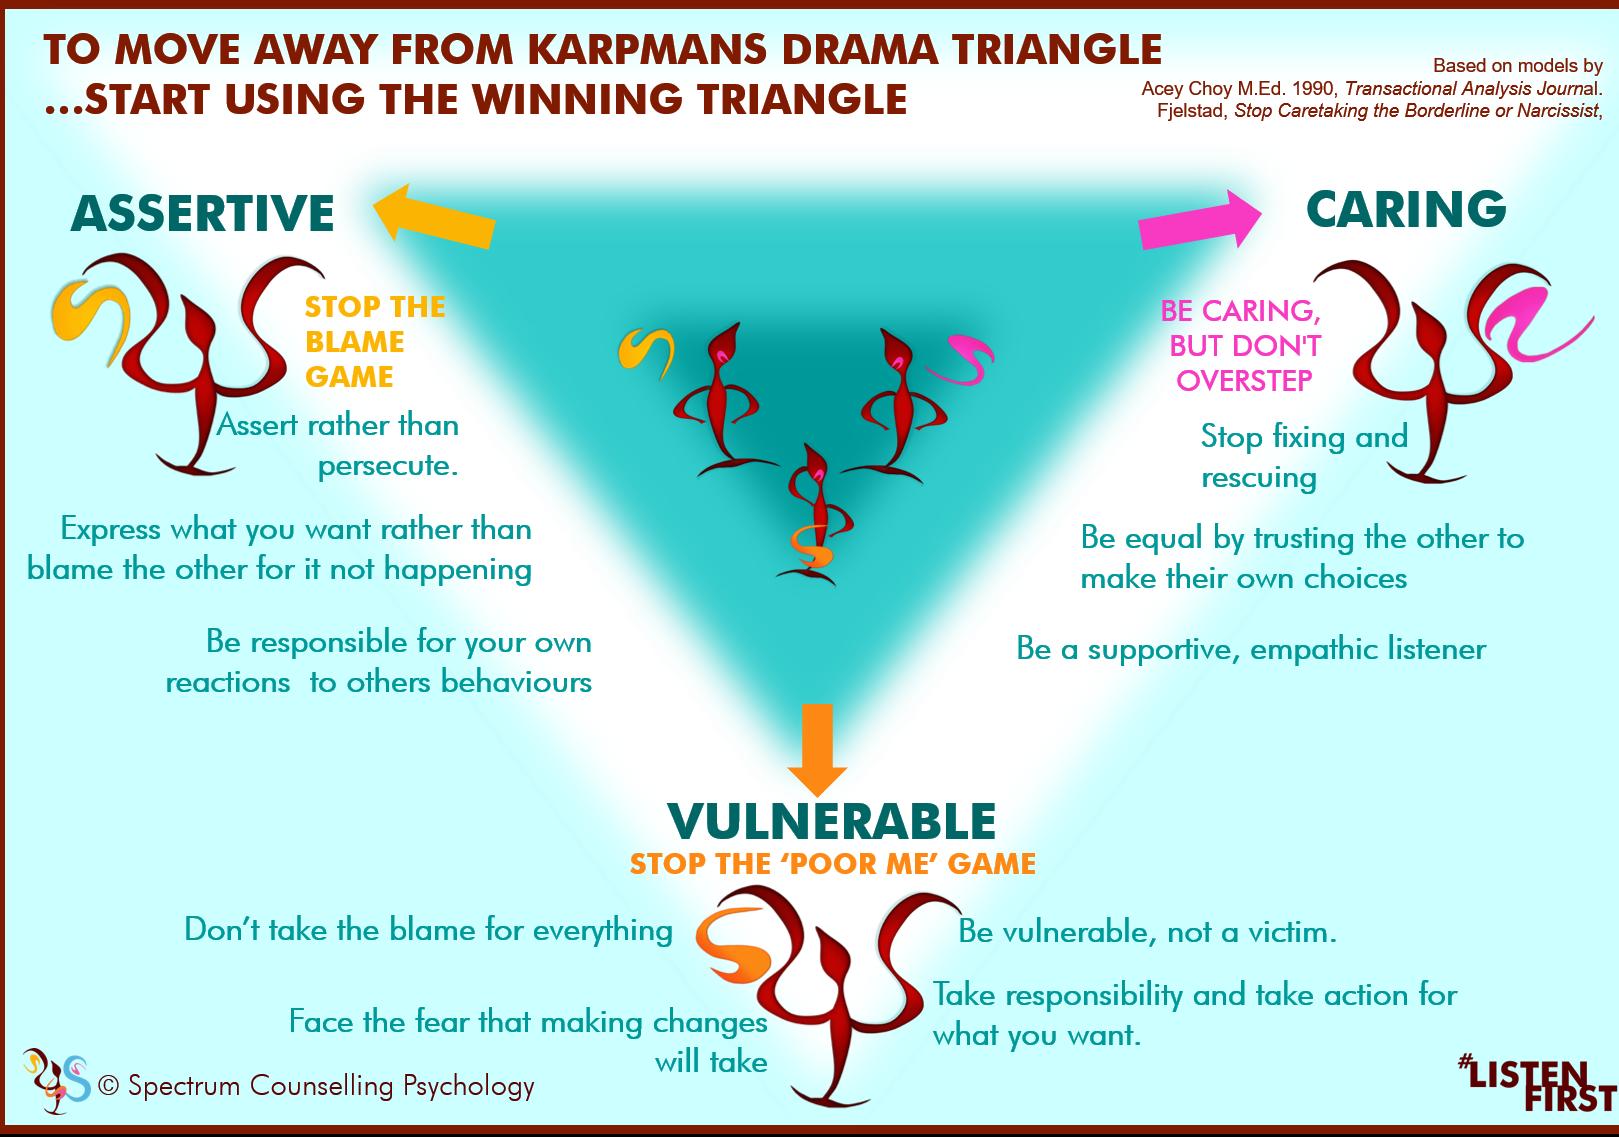 Karpmans drama triangle